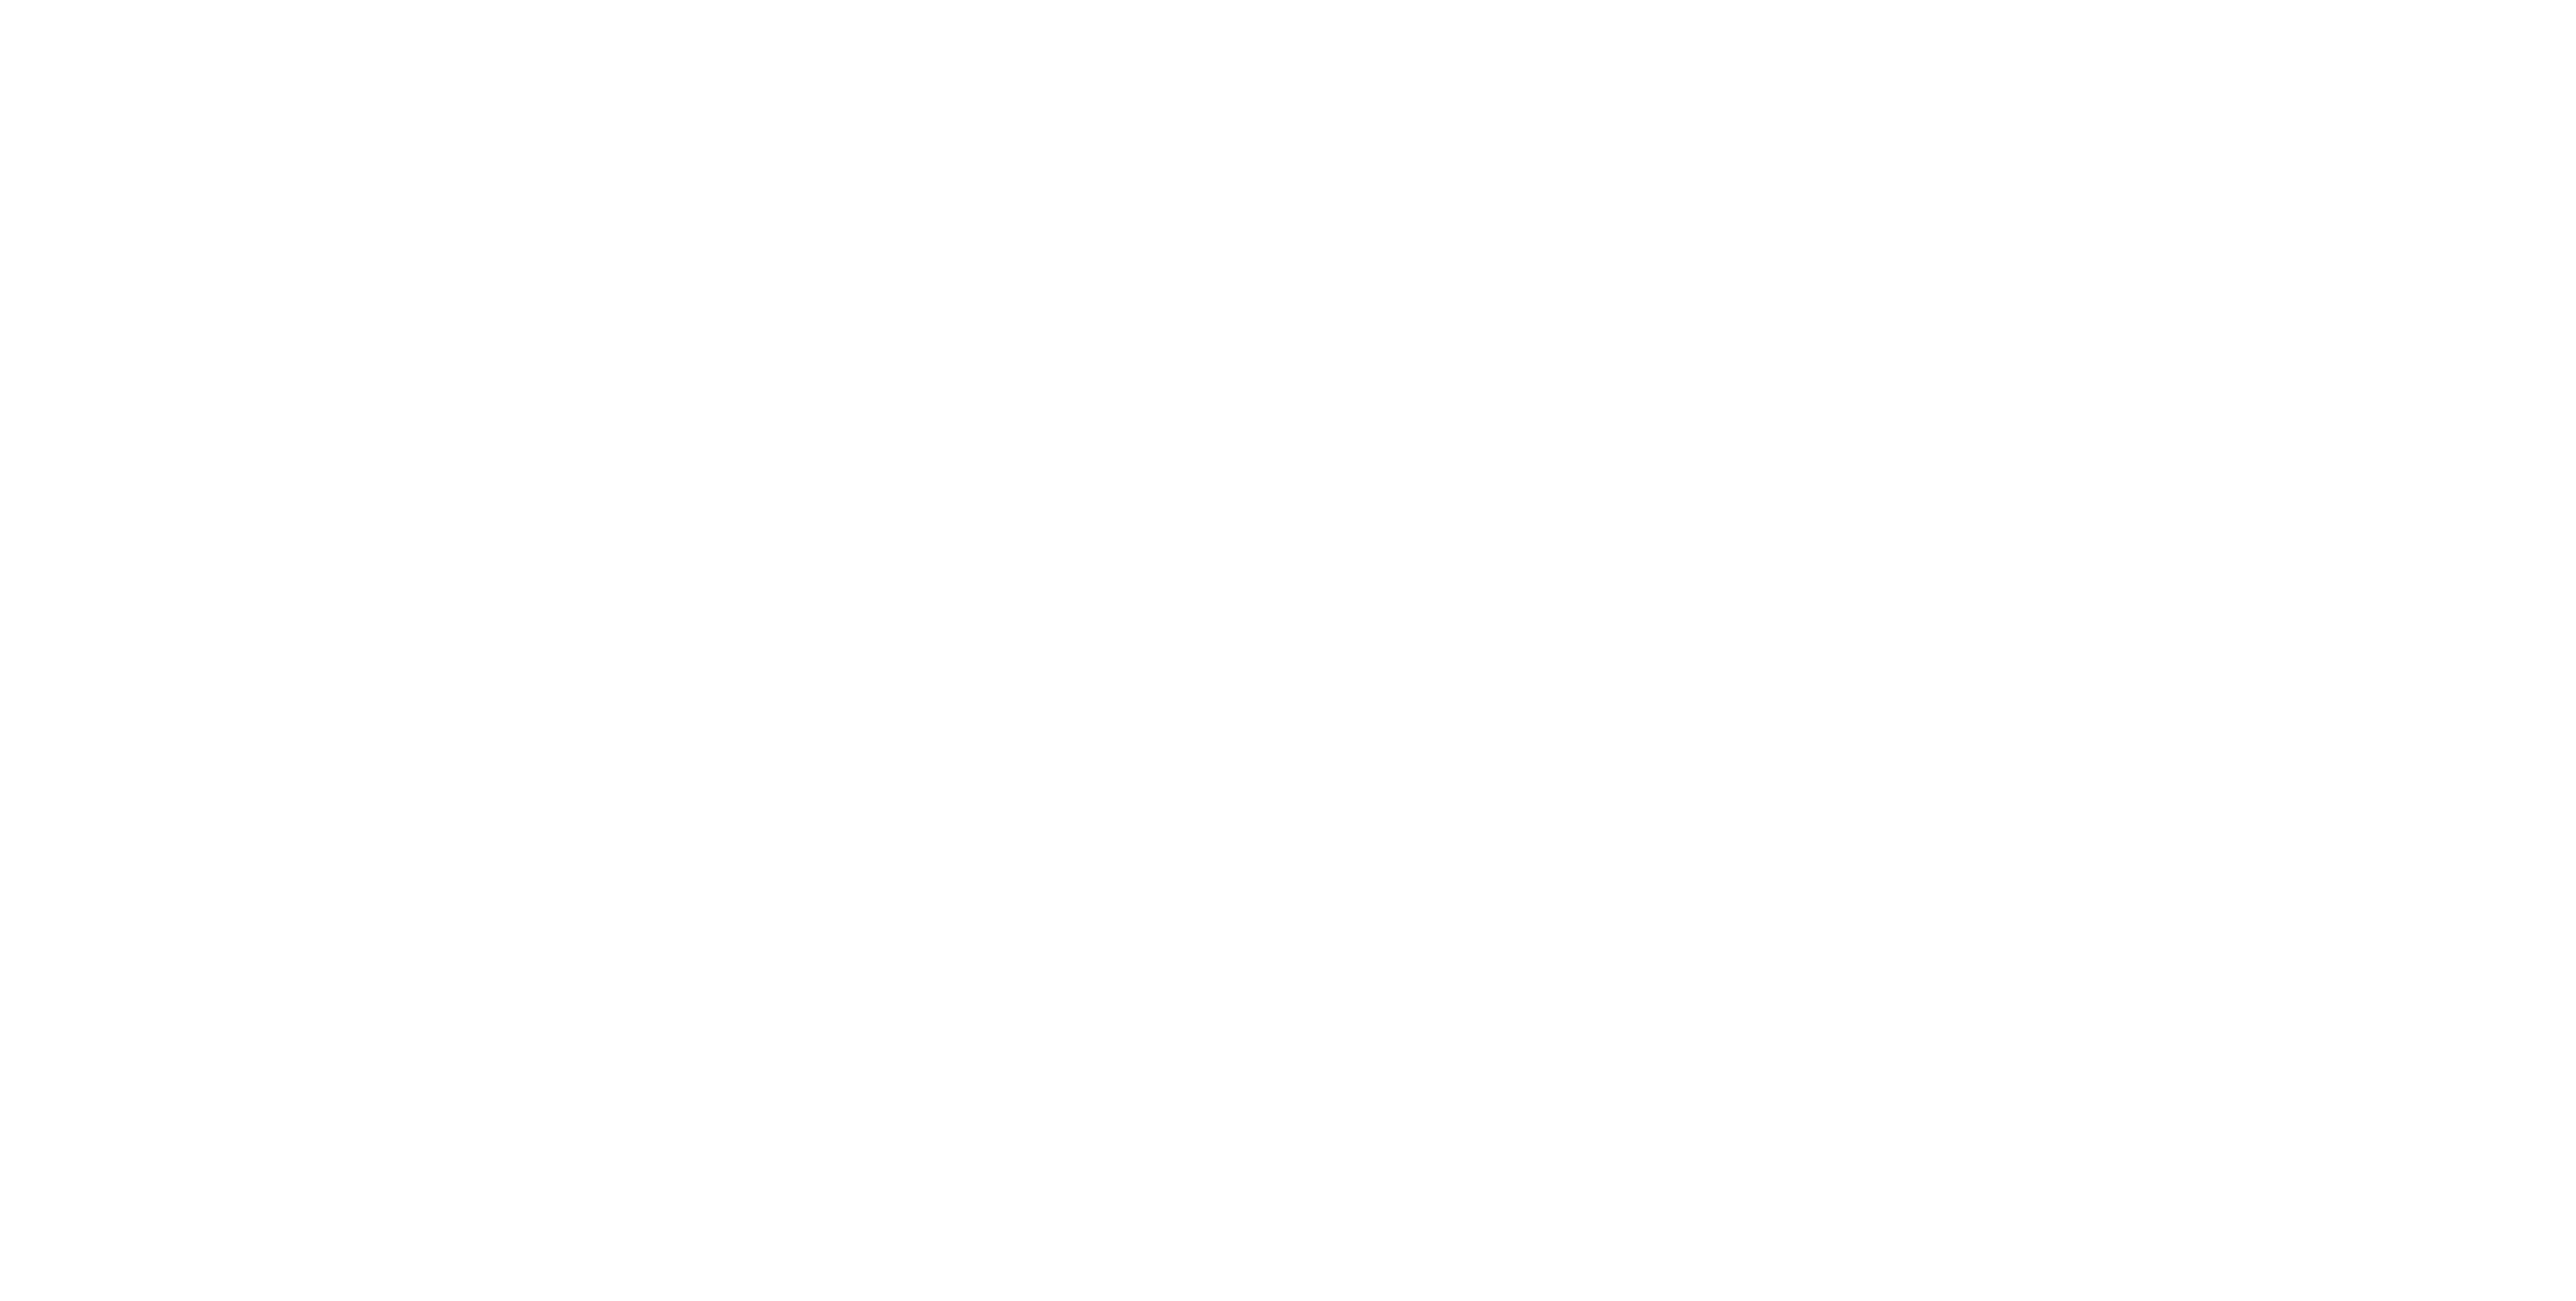 T C E logo